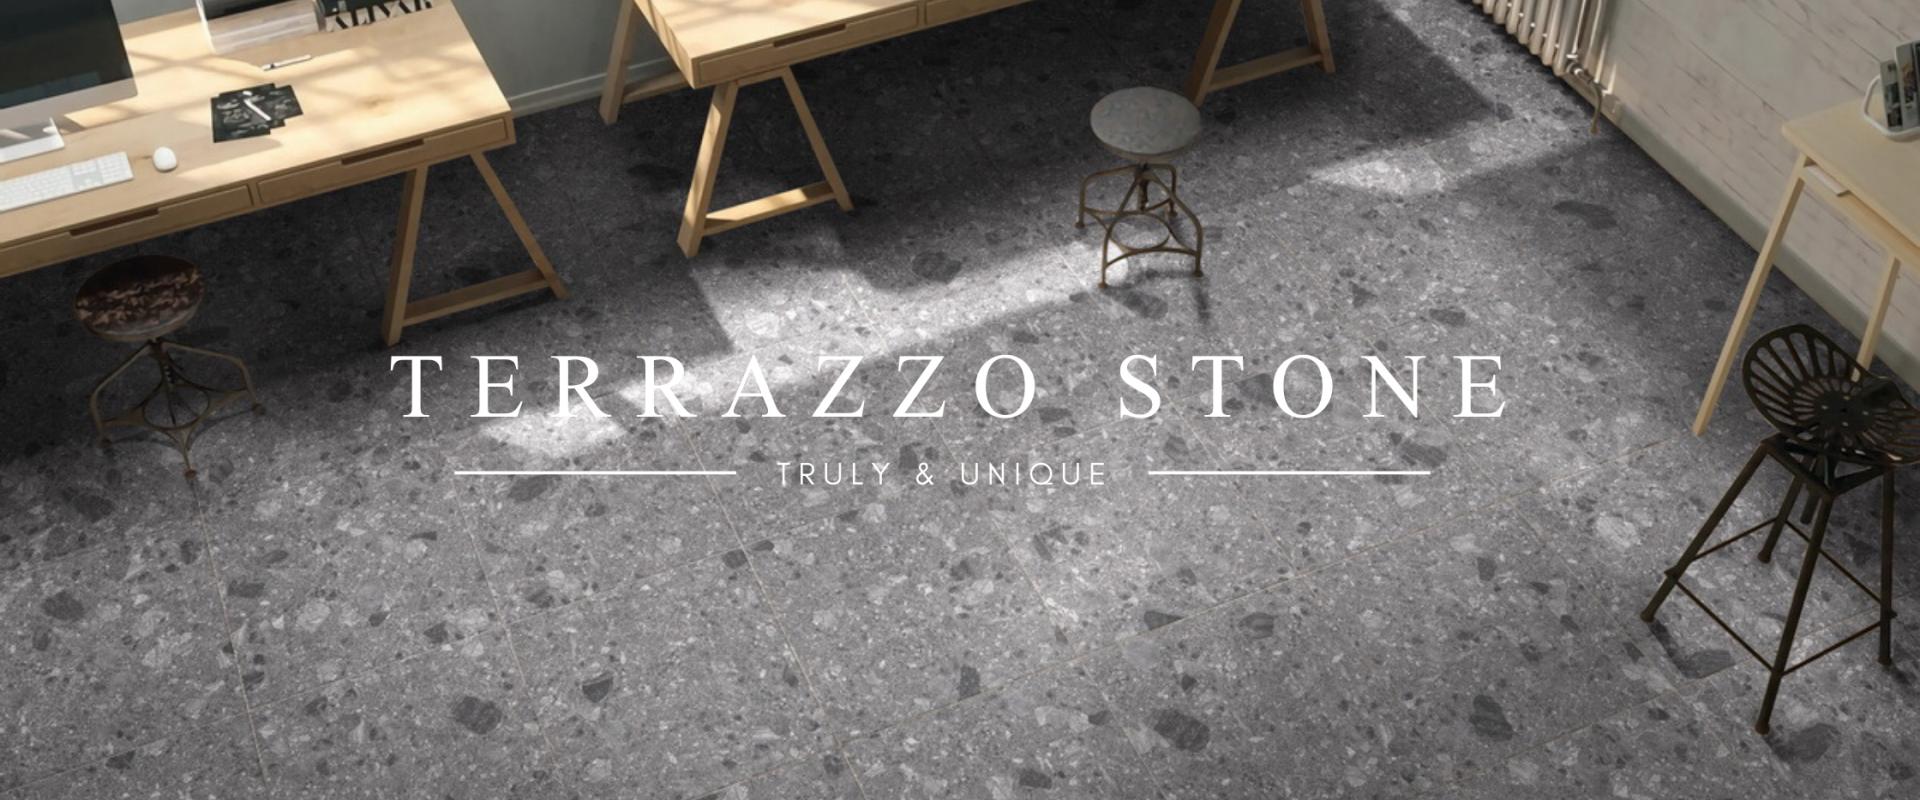 ProductBanner_Terrazzo